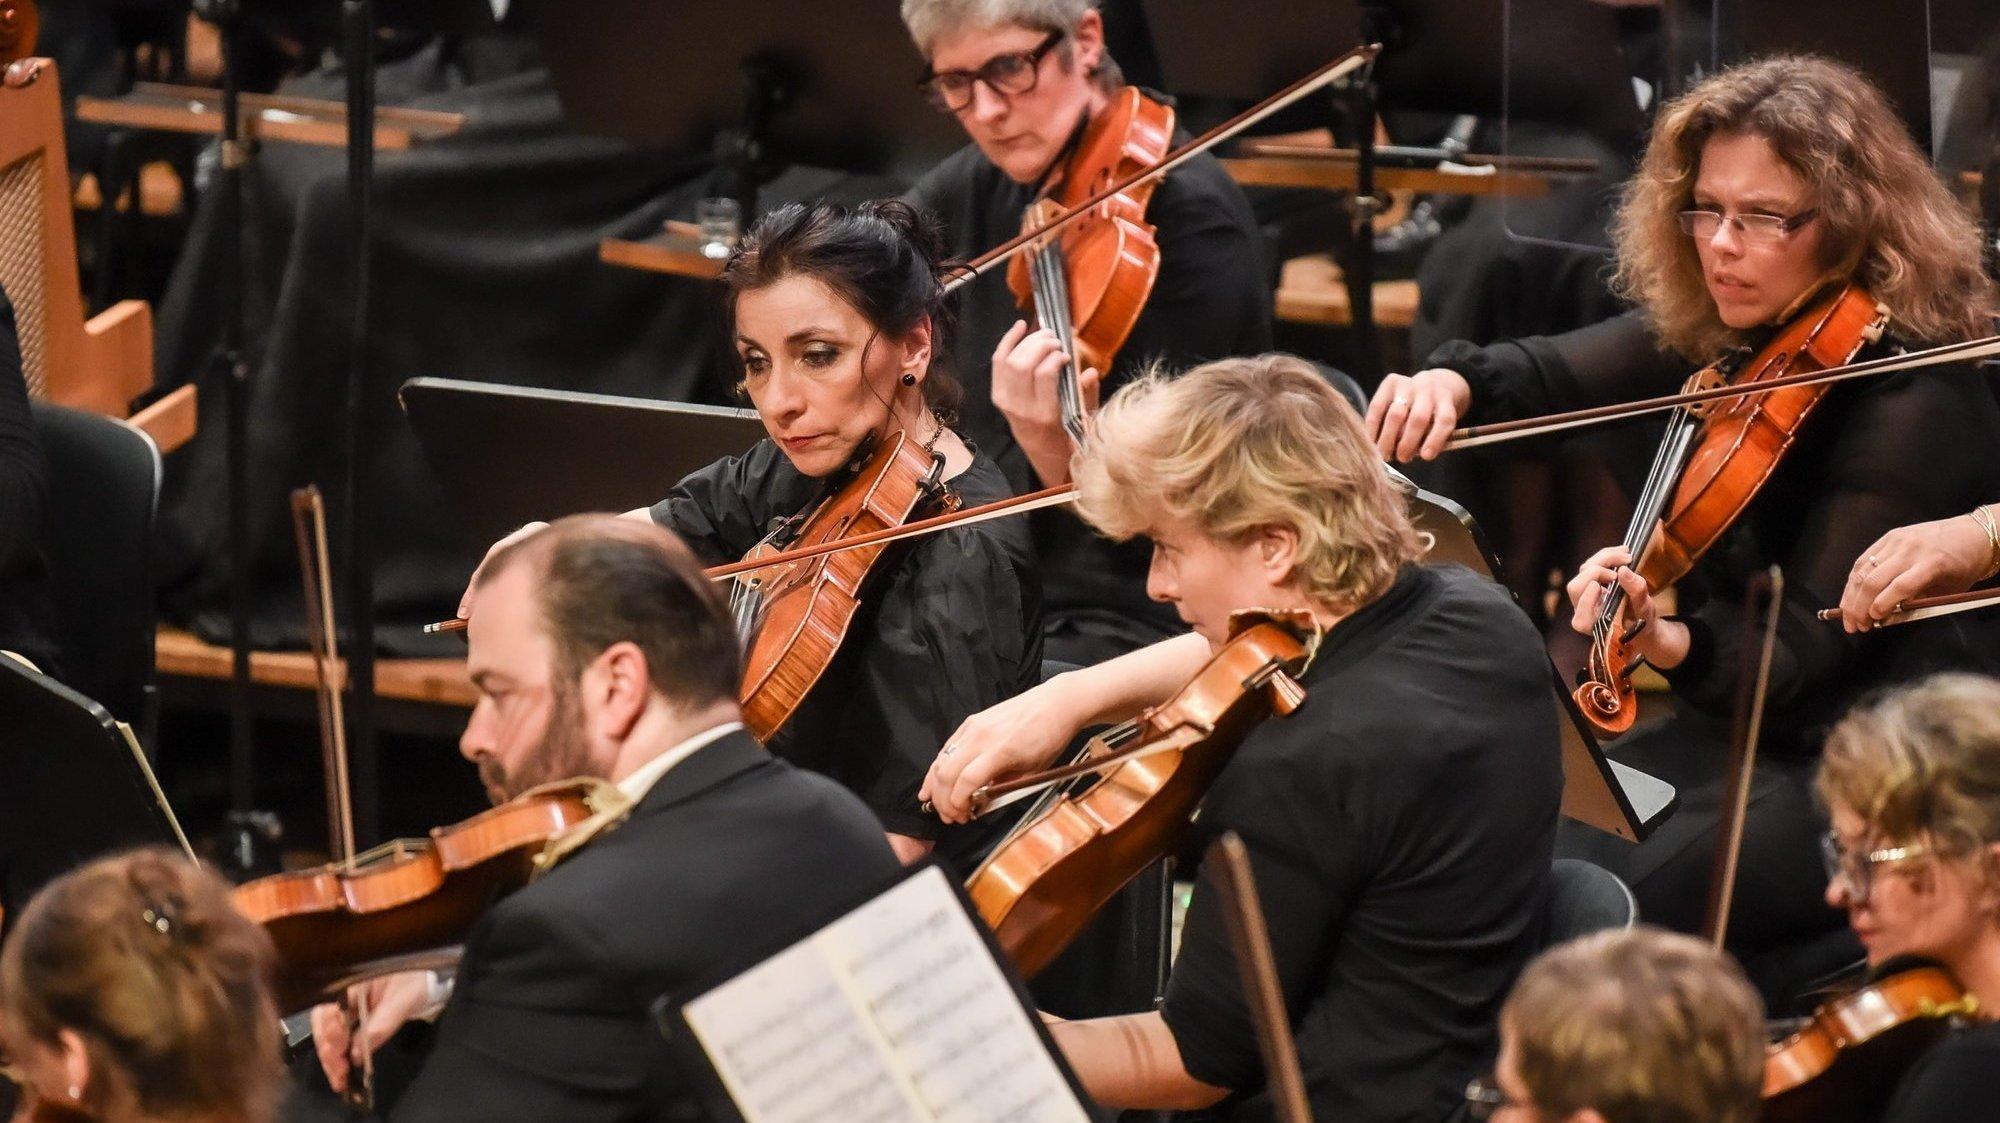 L'ESN interprétera des symphonies de Prokoviev, Schönberg et Mendelssohn.